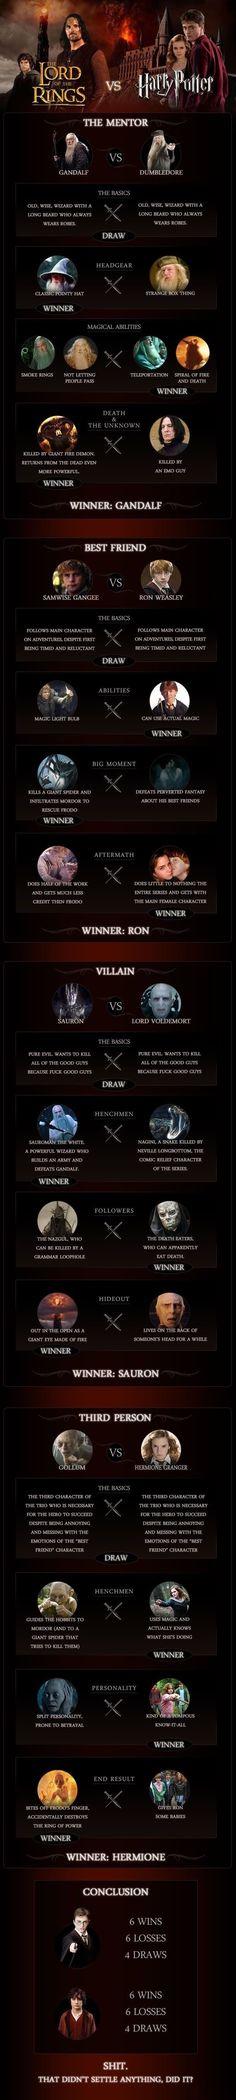 LOTR vs Harry Potter